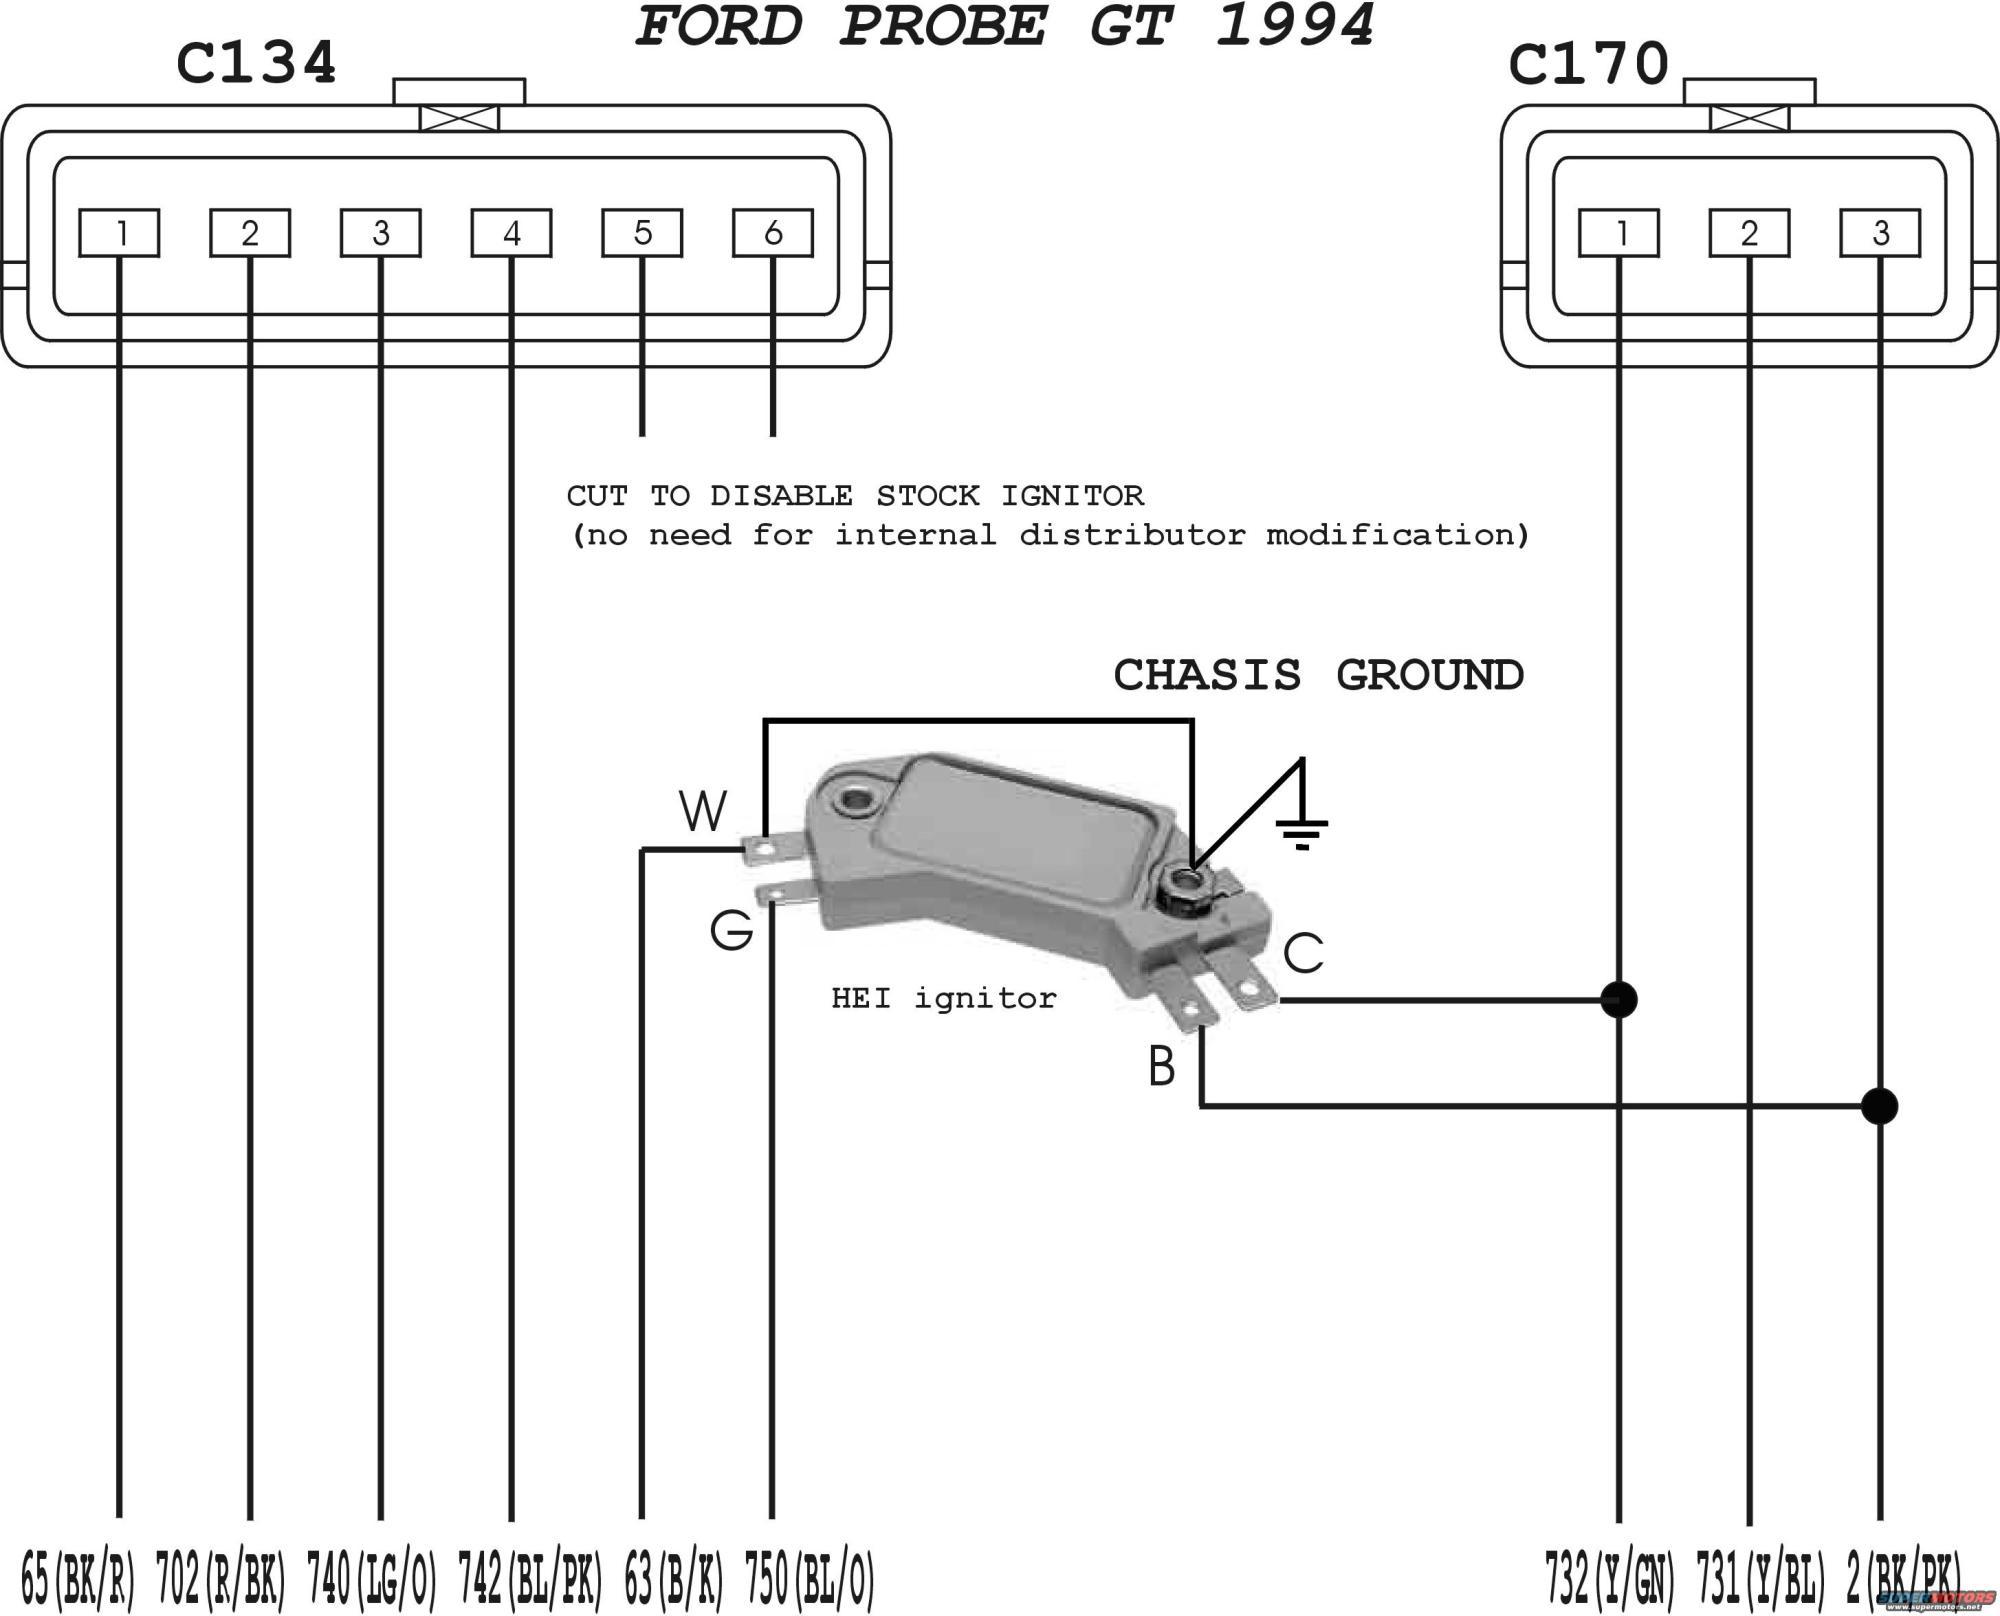 hight resolution of el camino wiring diagram el camino pipes u2022 wiring diagrams chevy 350 hei wiring mallory hei distributor parts diagram